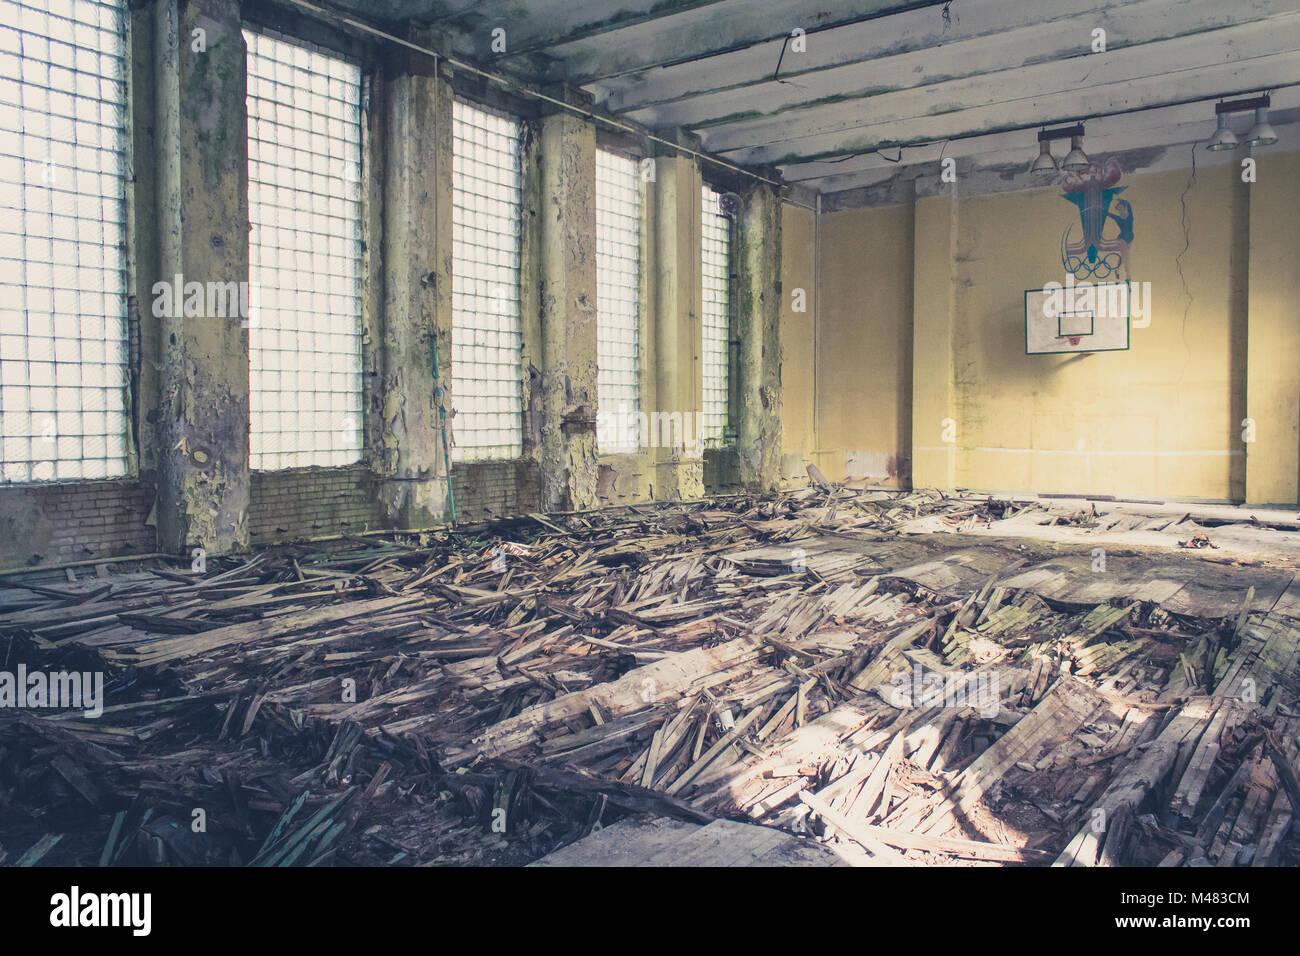 Antiguo pabellón de deportes baloncesto , escuela abandonada Foto de stock